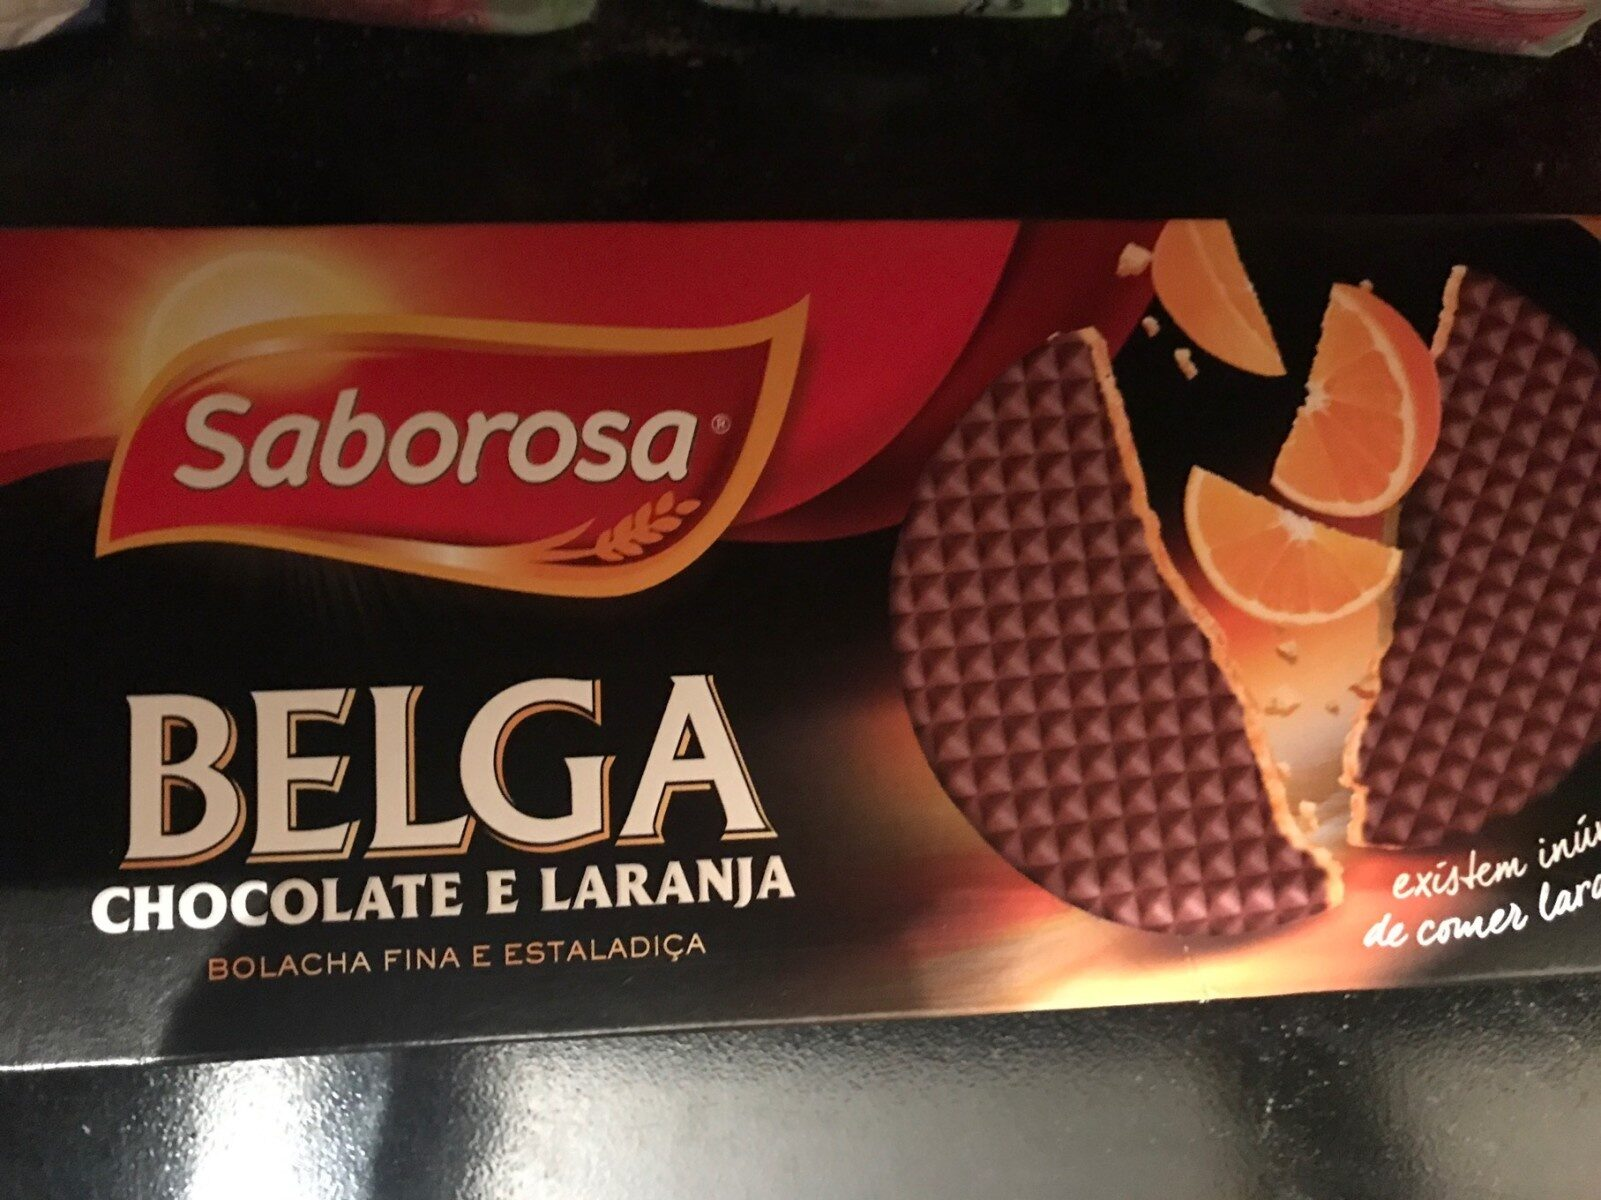 Belga chocolate e laranja - Produit - fr